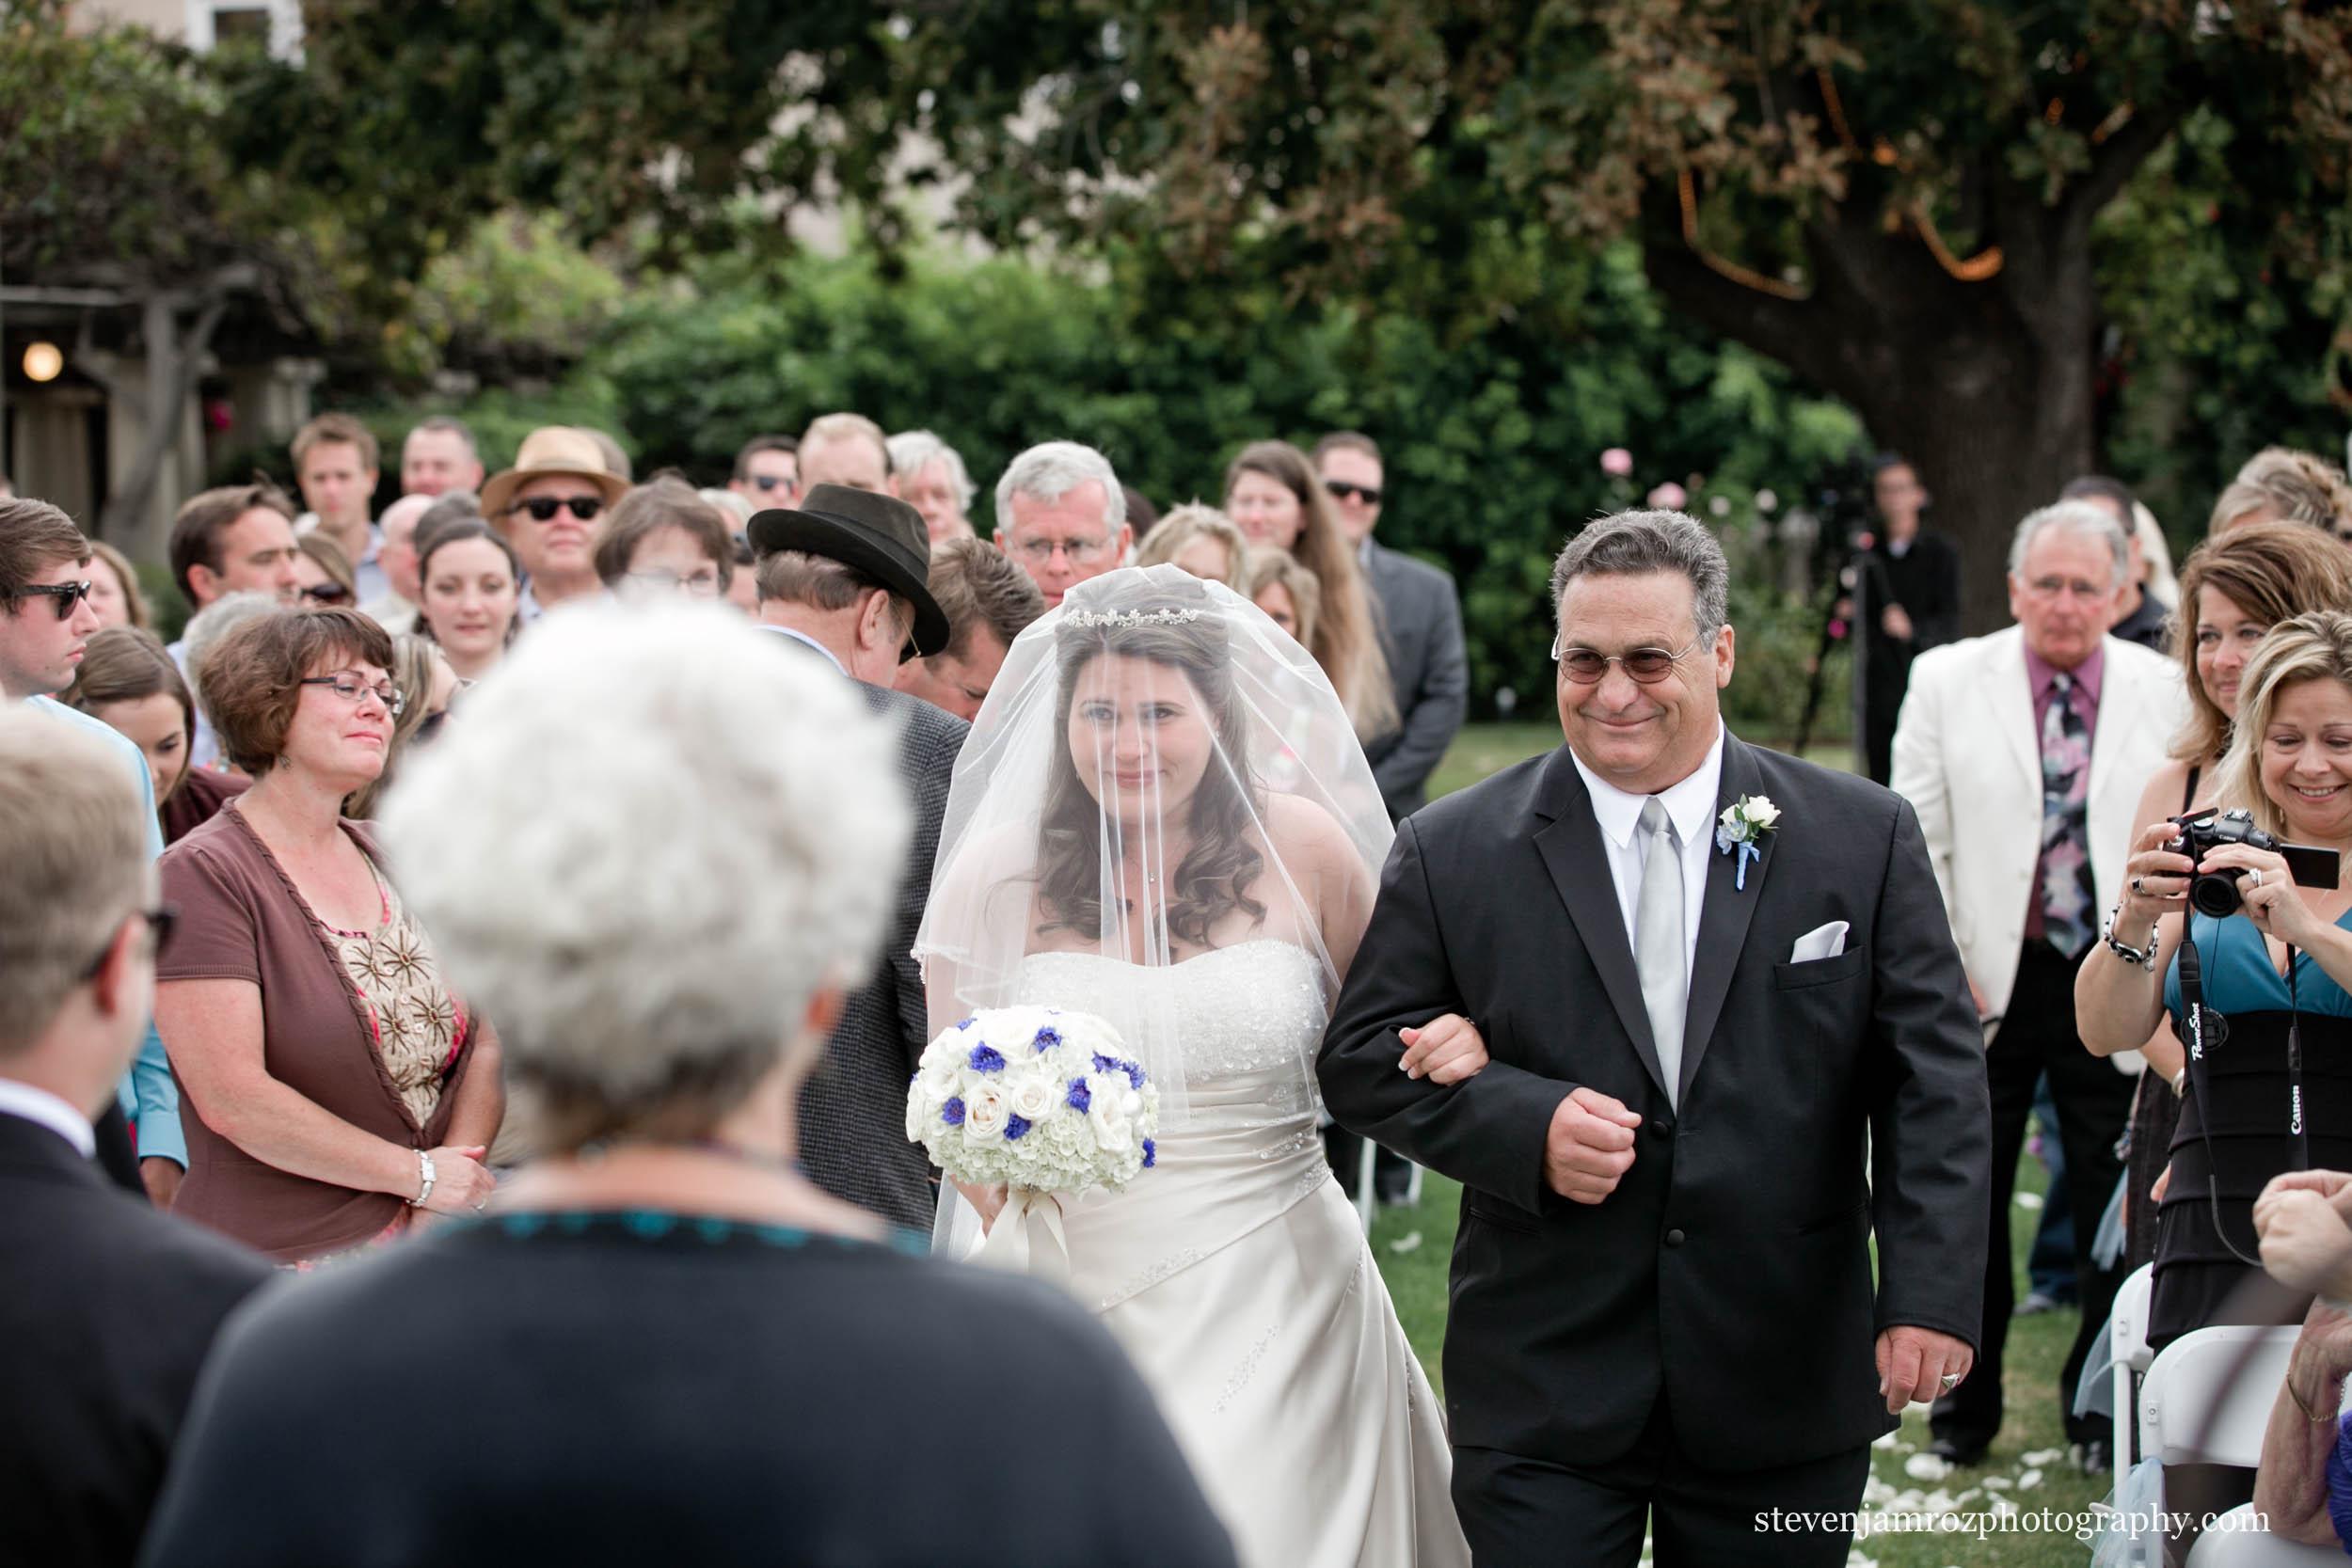 dad-walking-bride-down-aisle-raleigh-steven-jamroz-photography-0236.jpg